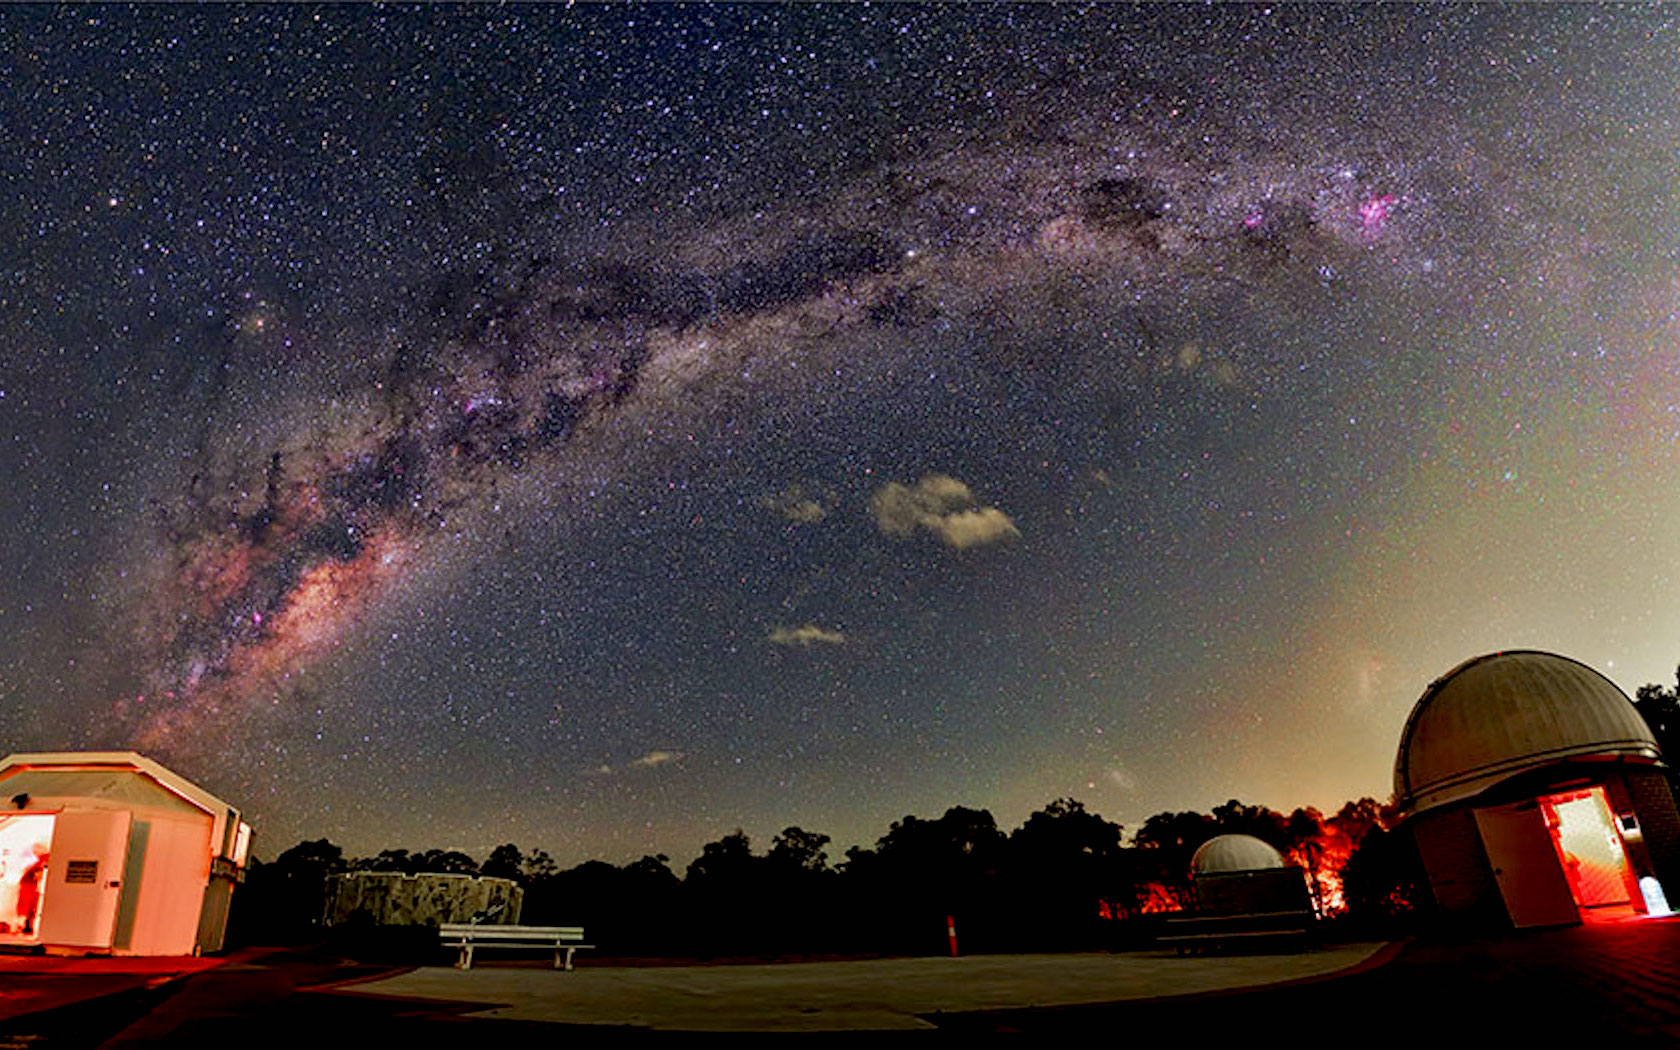 Perth stargazing